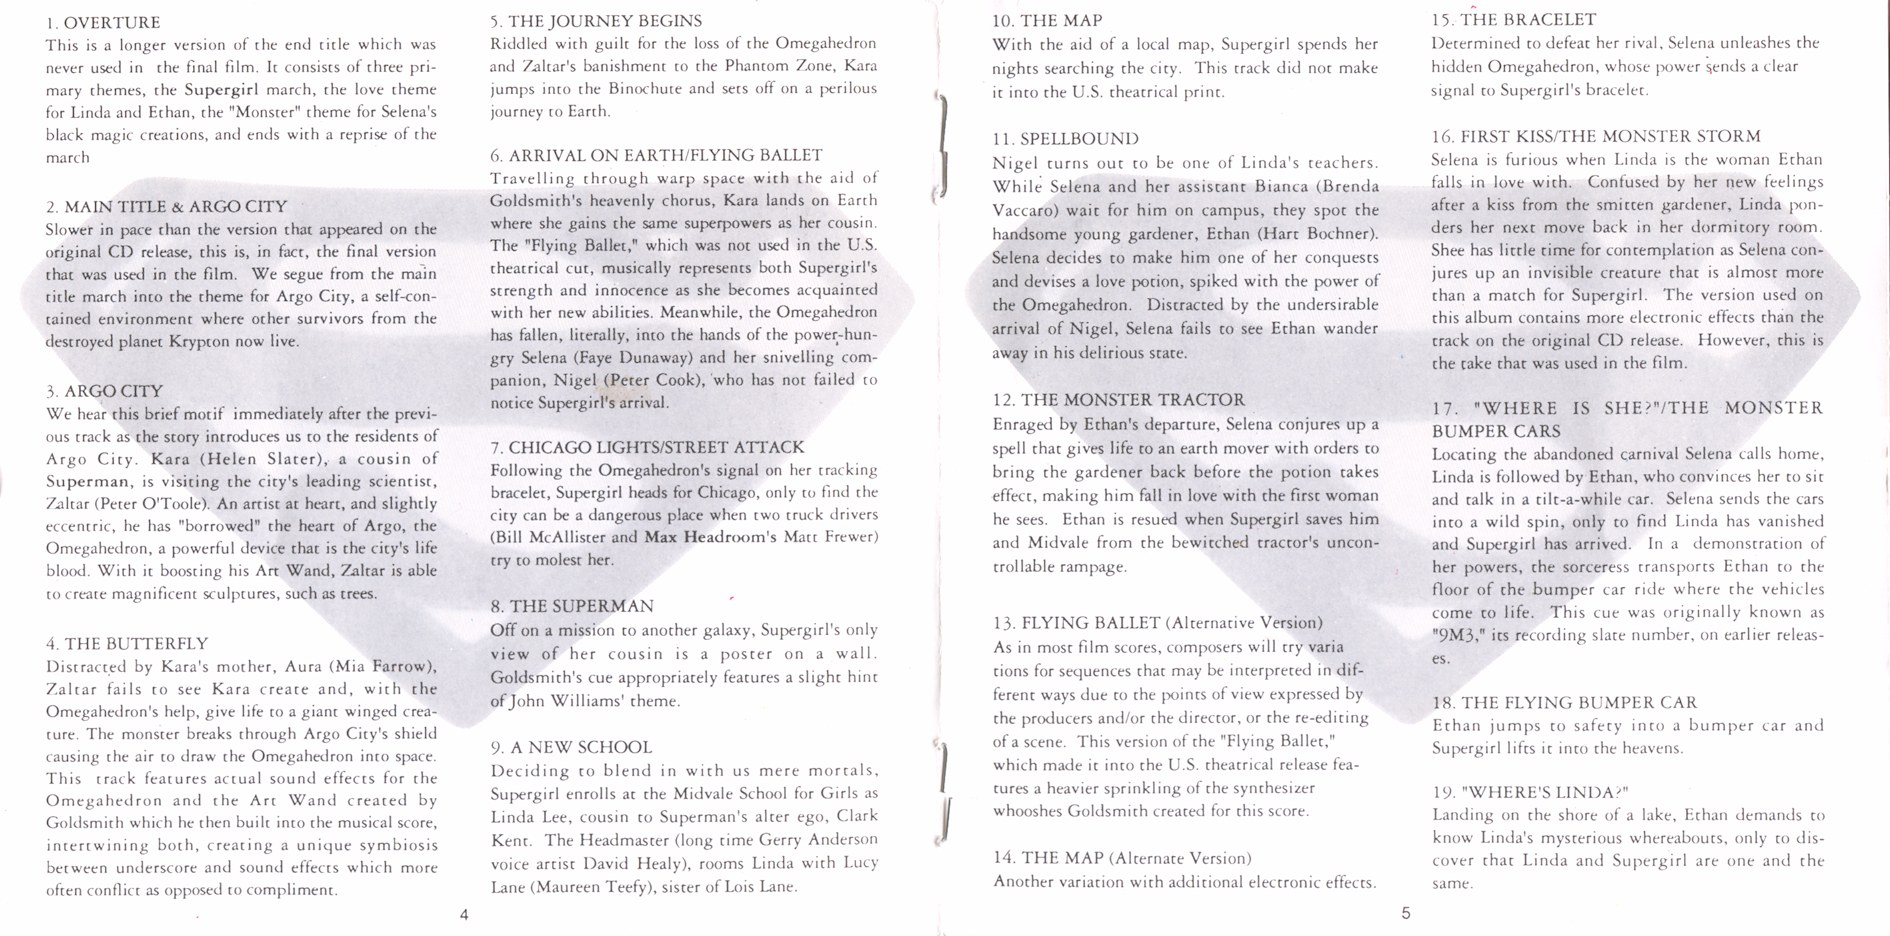 Booklet p03-04